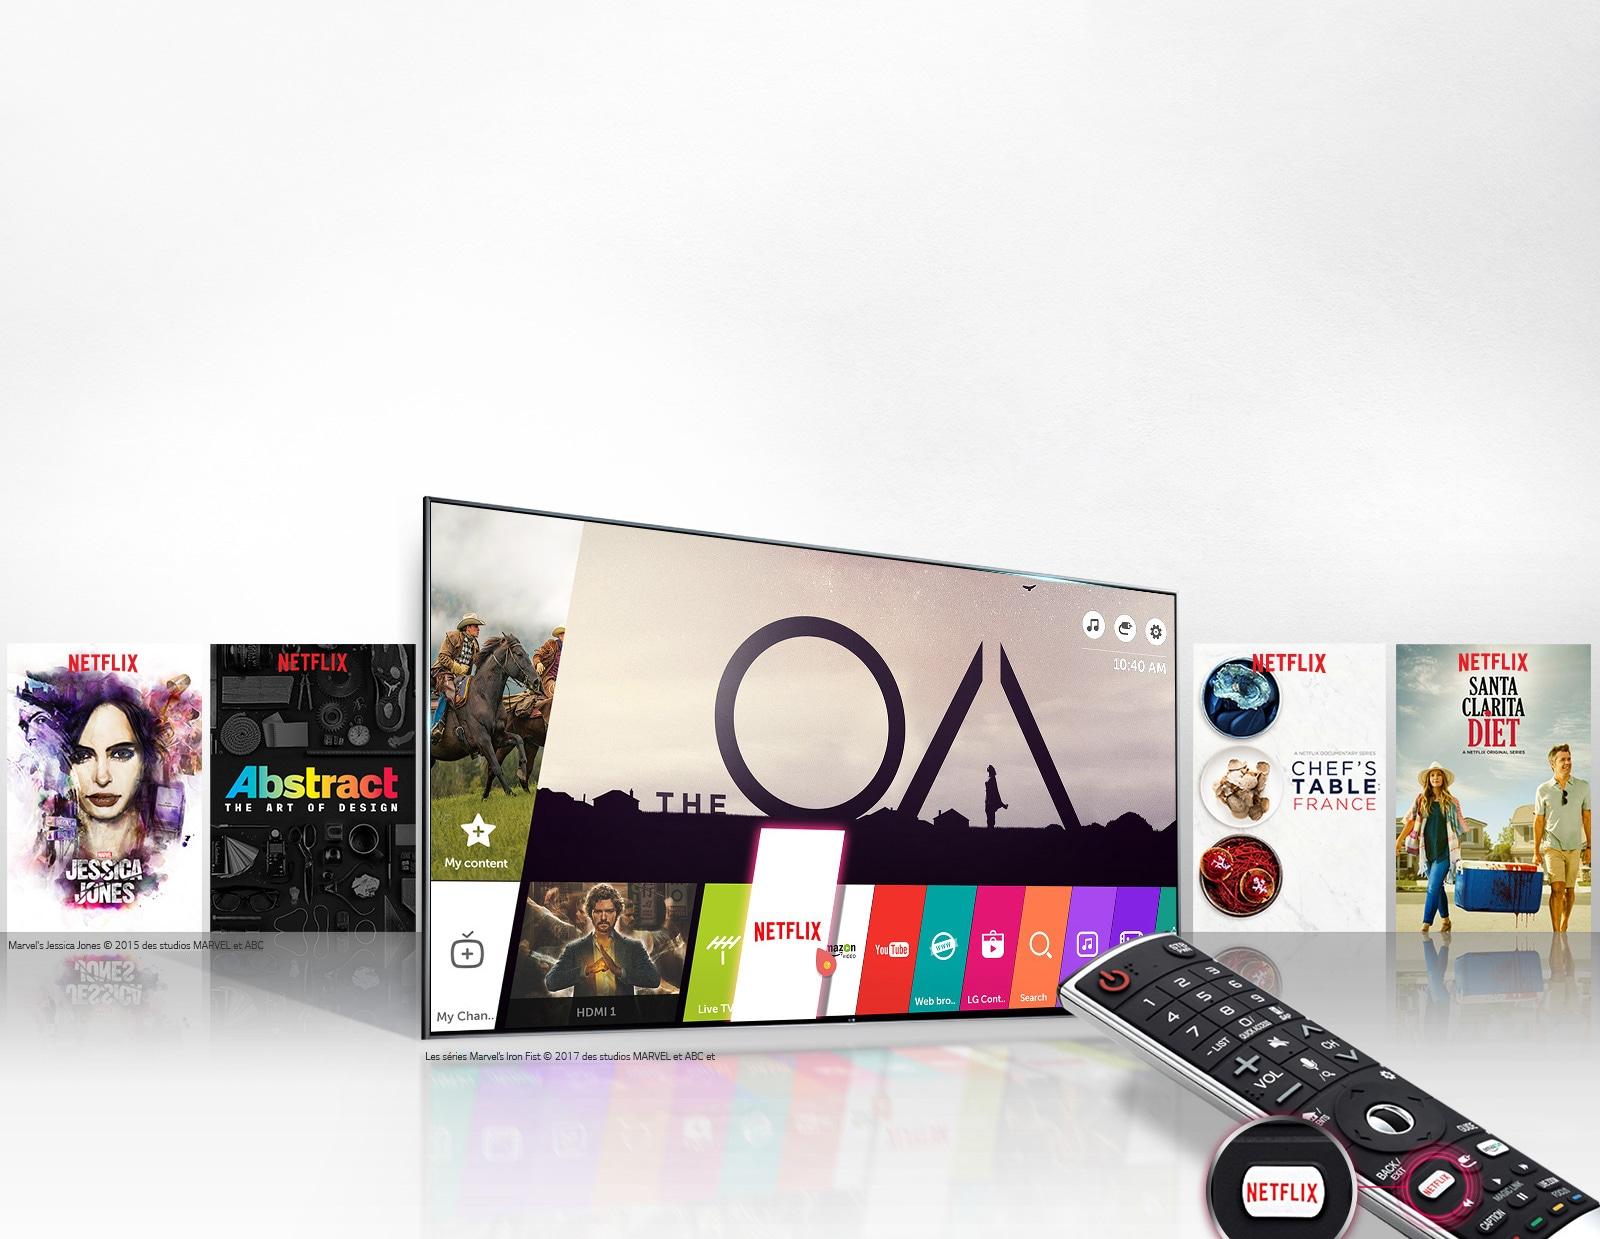 OLED_Netflix_d_v2.0